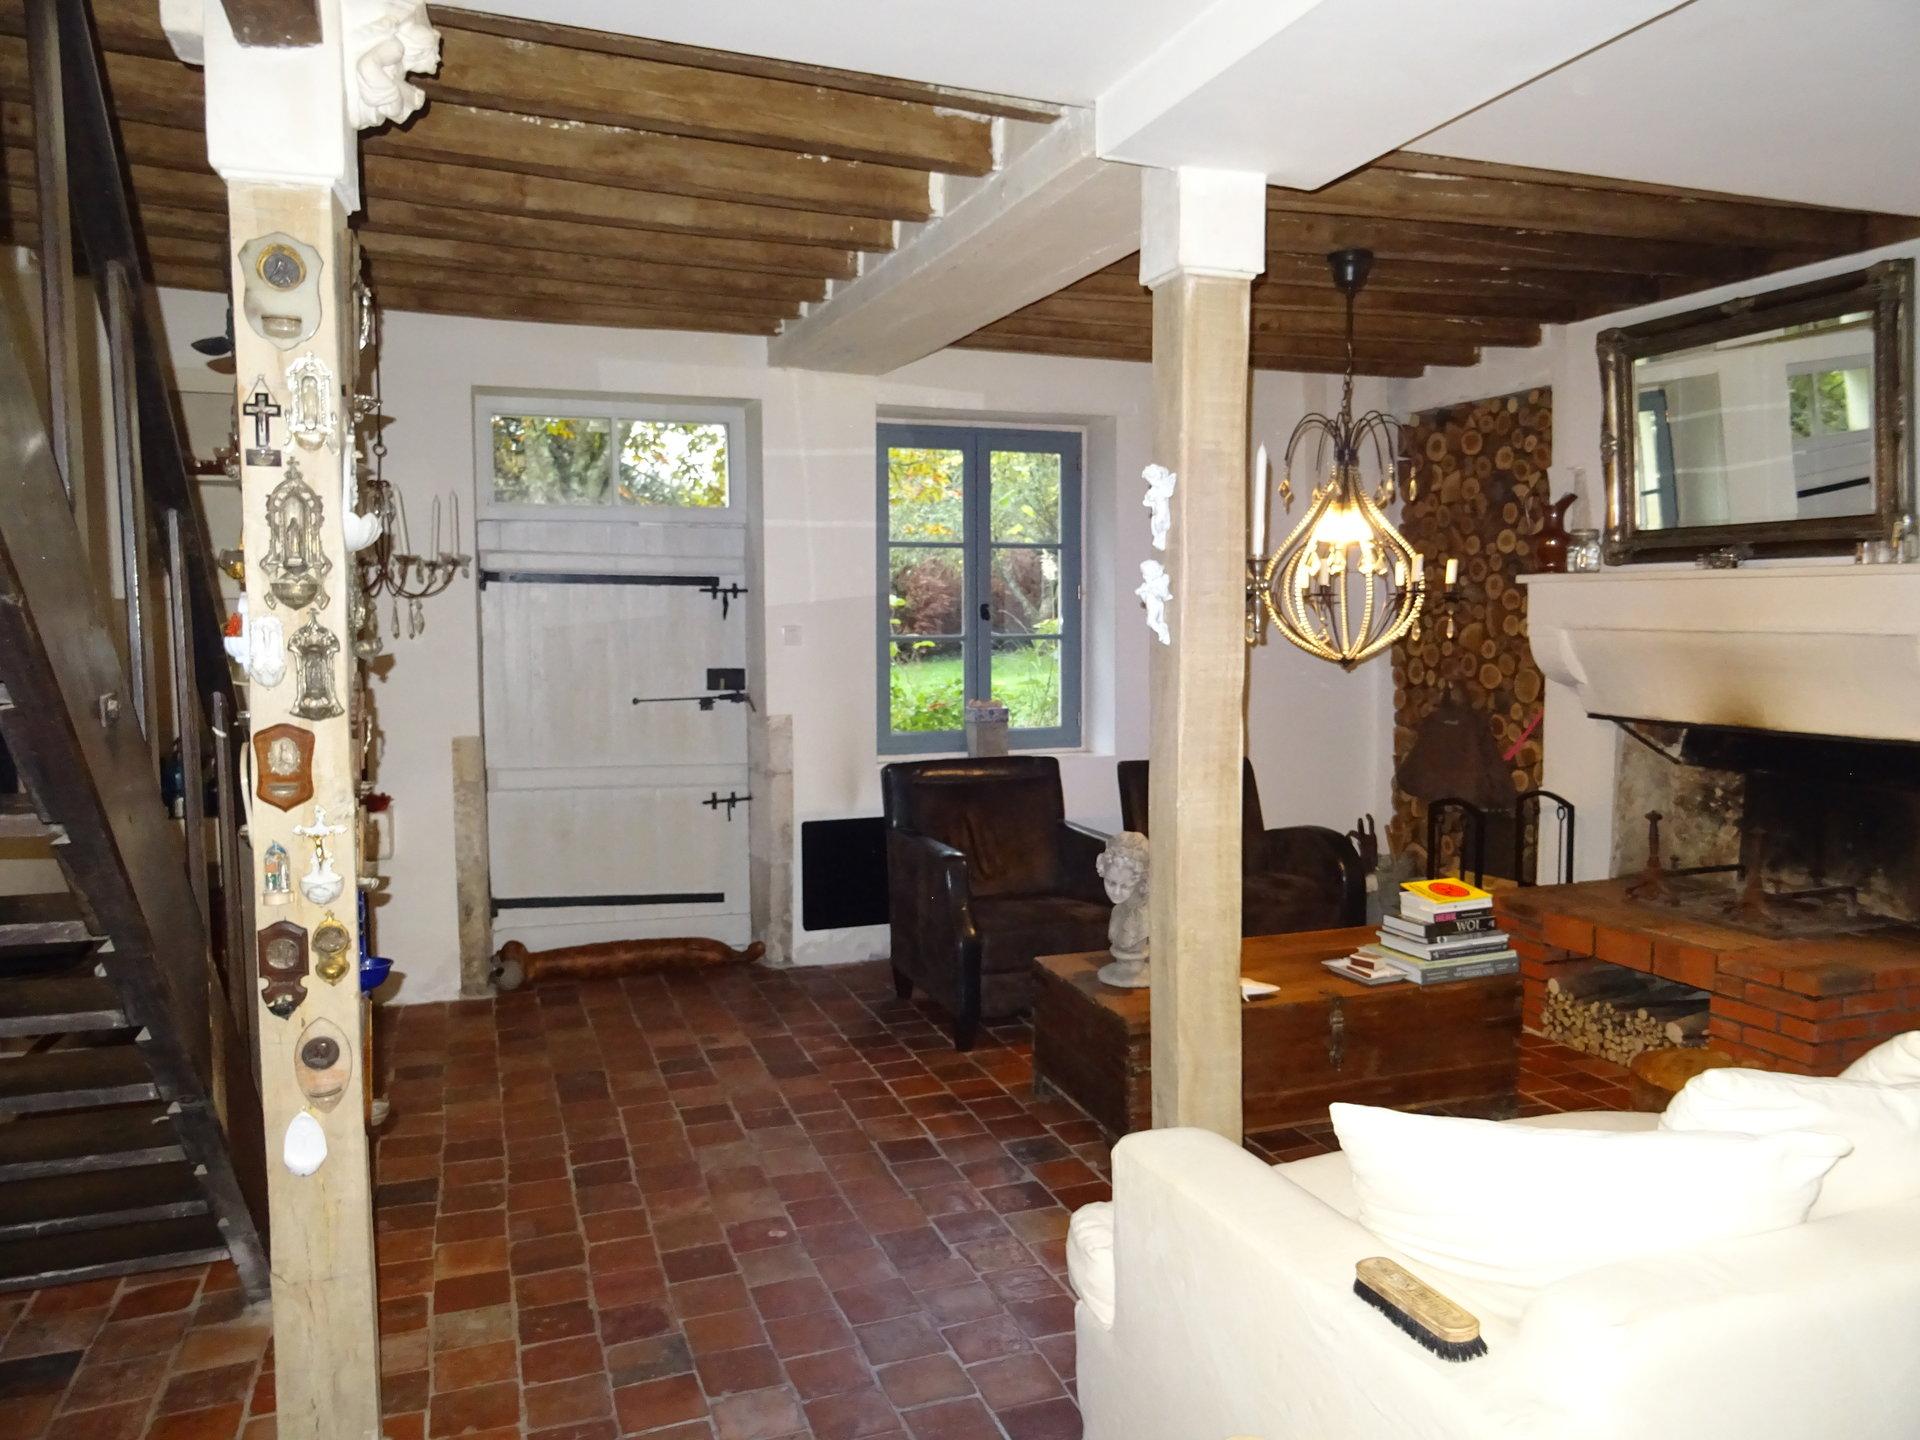 Maison restaurée avec étang